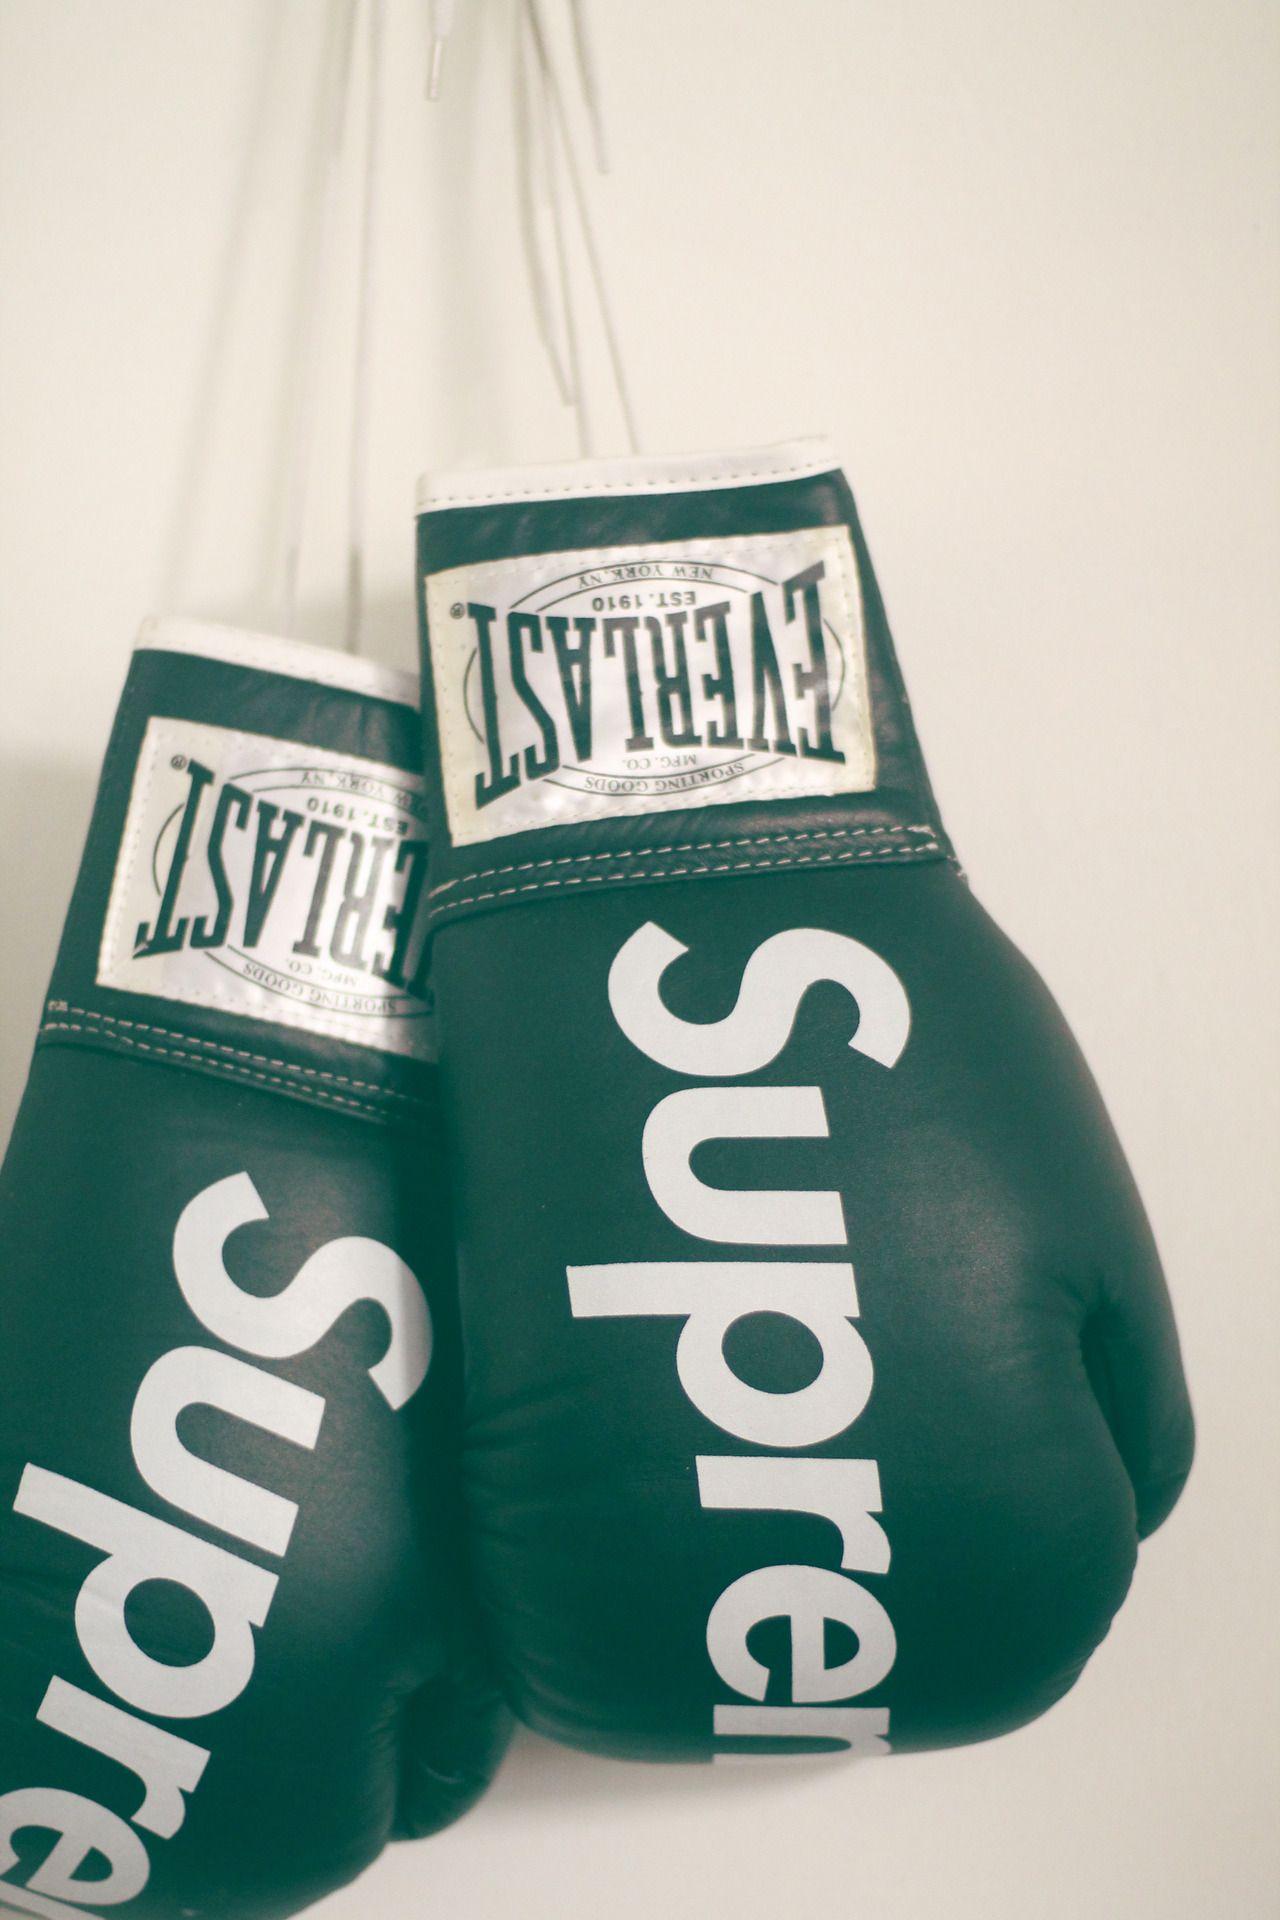 6b96927f Supreme | Street Credit | Everlast boxing gloves, Supreme, Boxing gloves